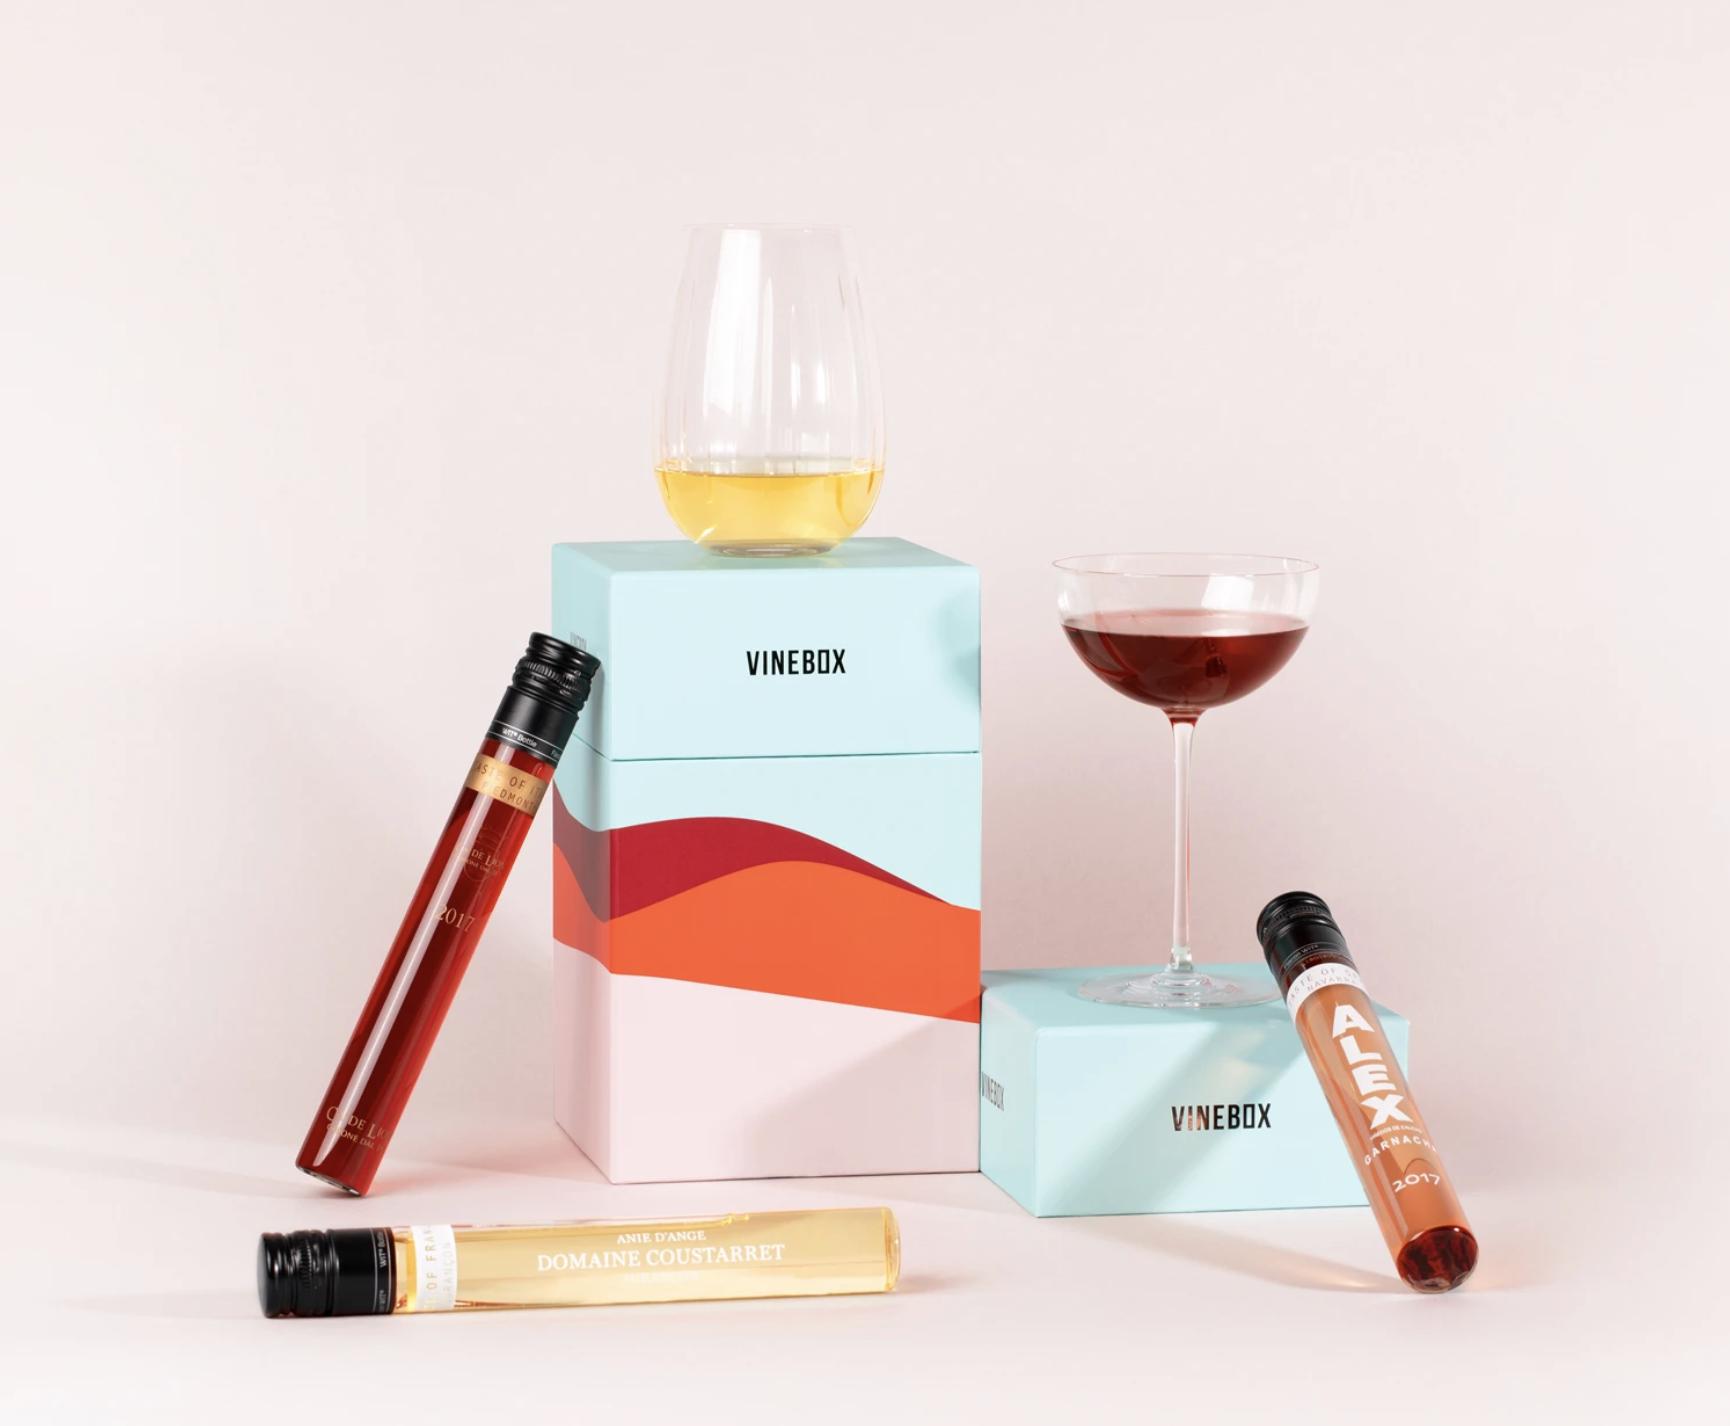 VINEBOX wine box